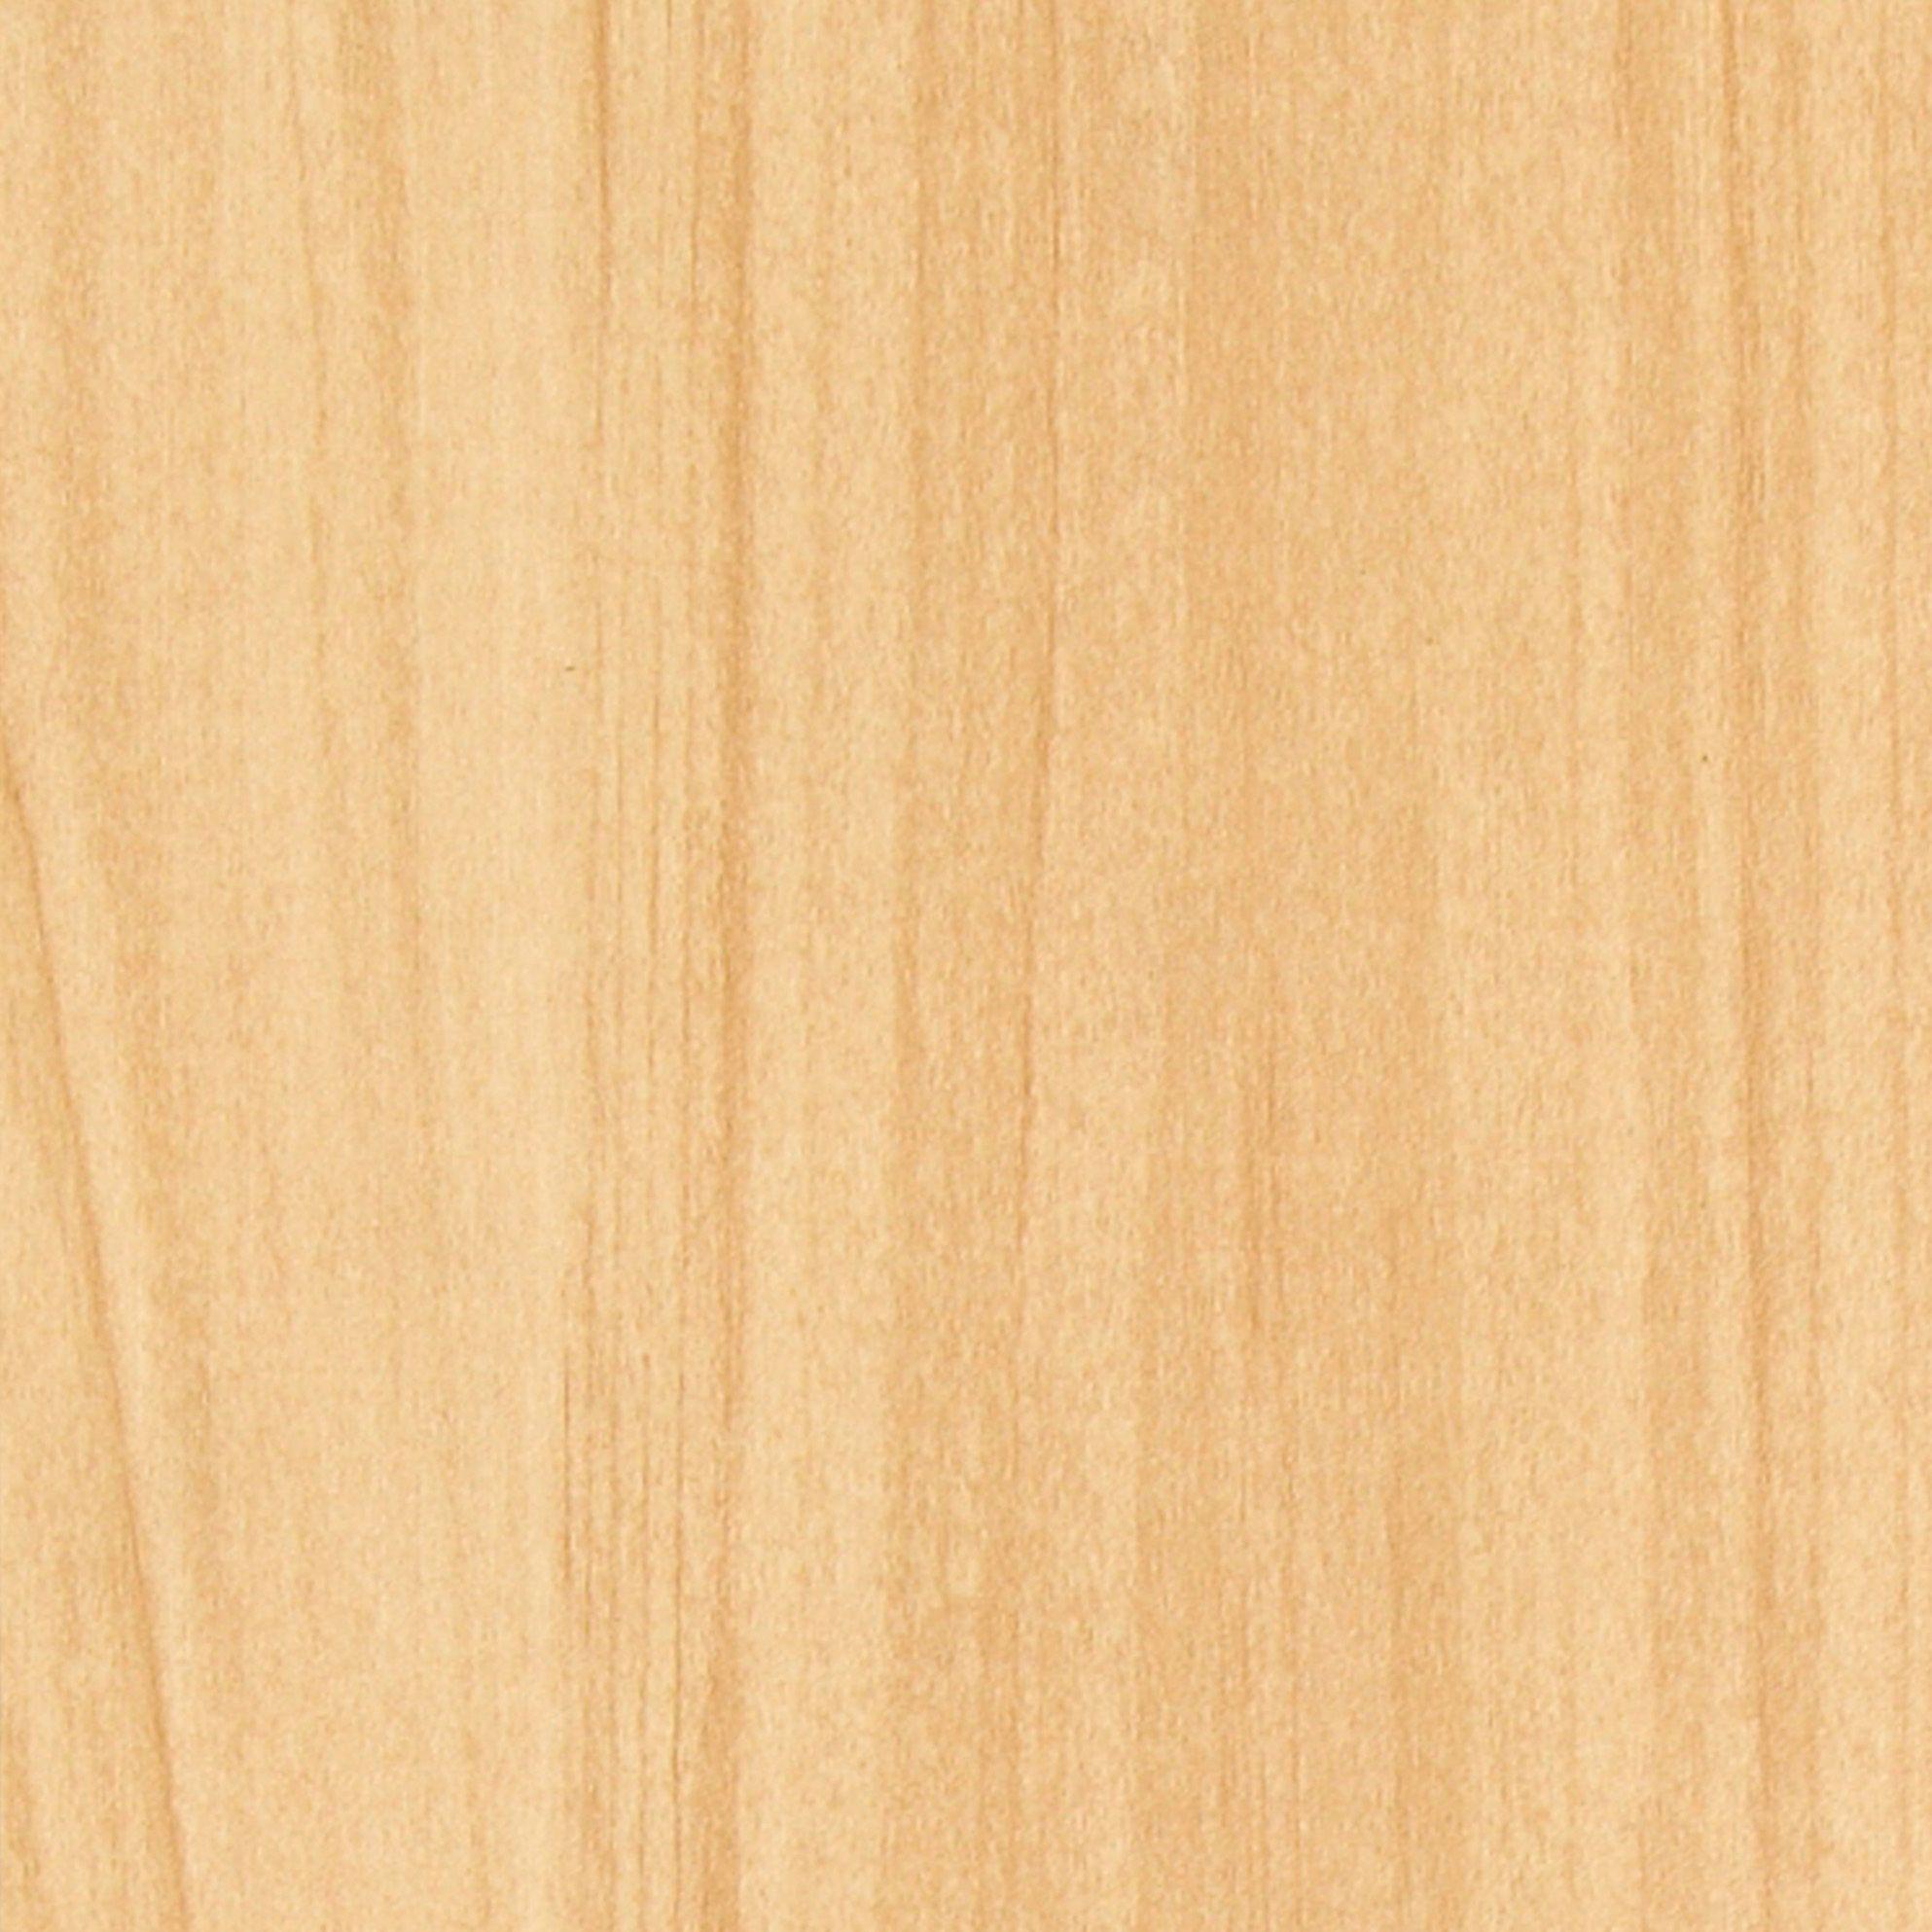 Self Adhesive Natural Wood Effect Vinyl Plank 0 83m 178 Pack